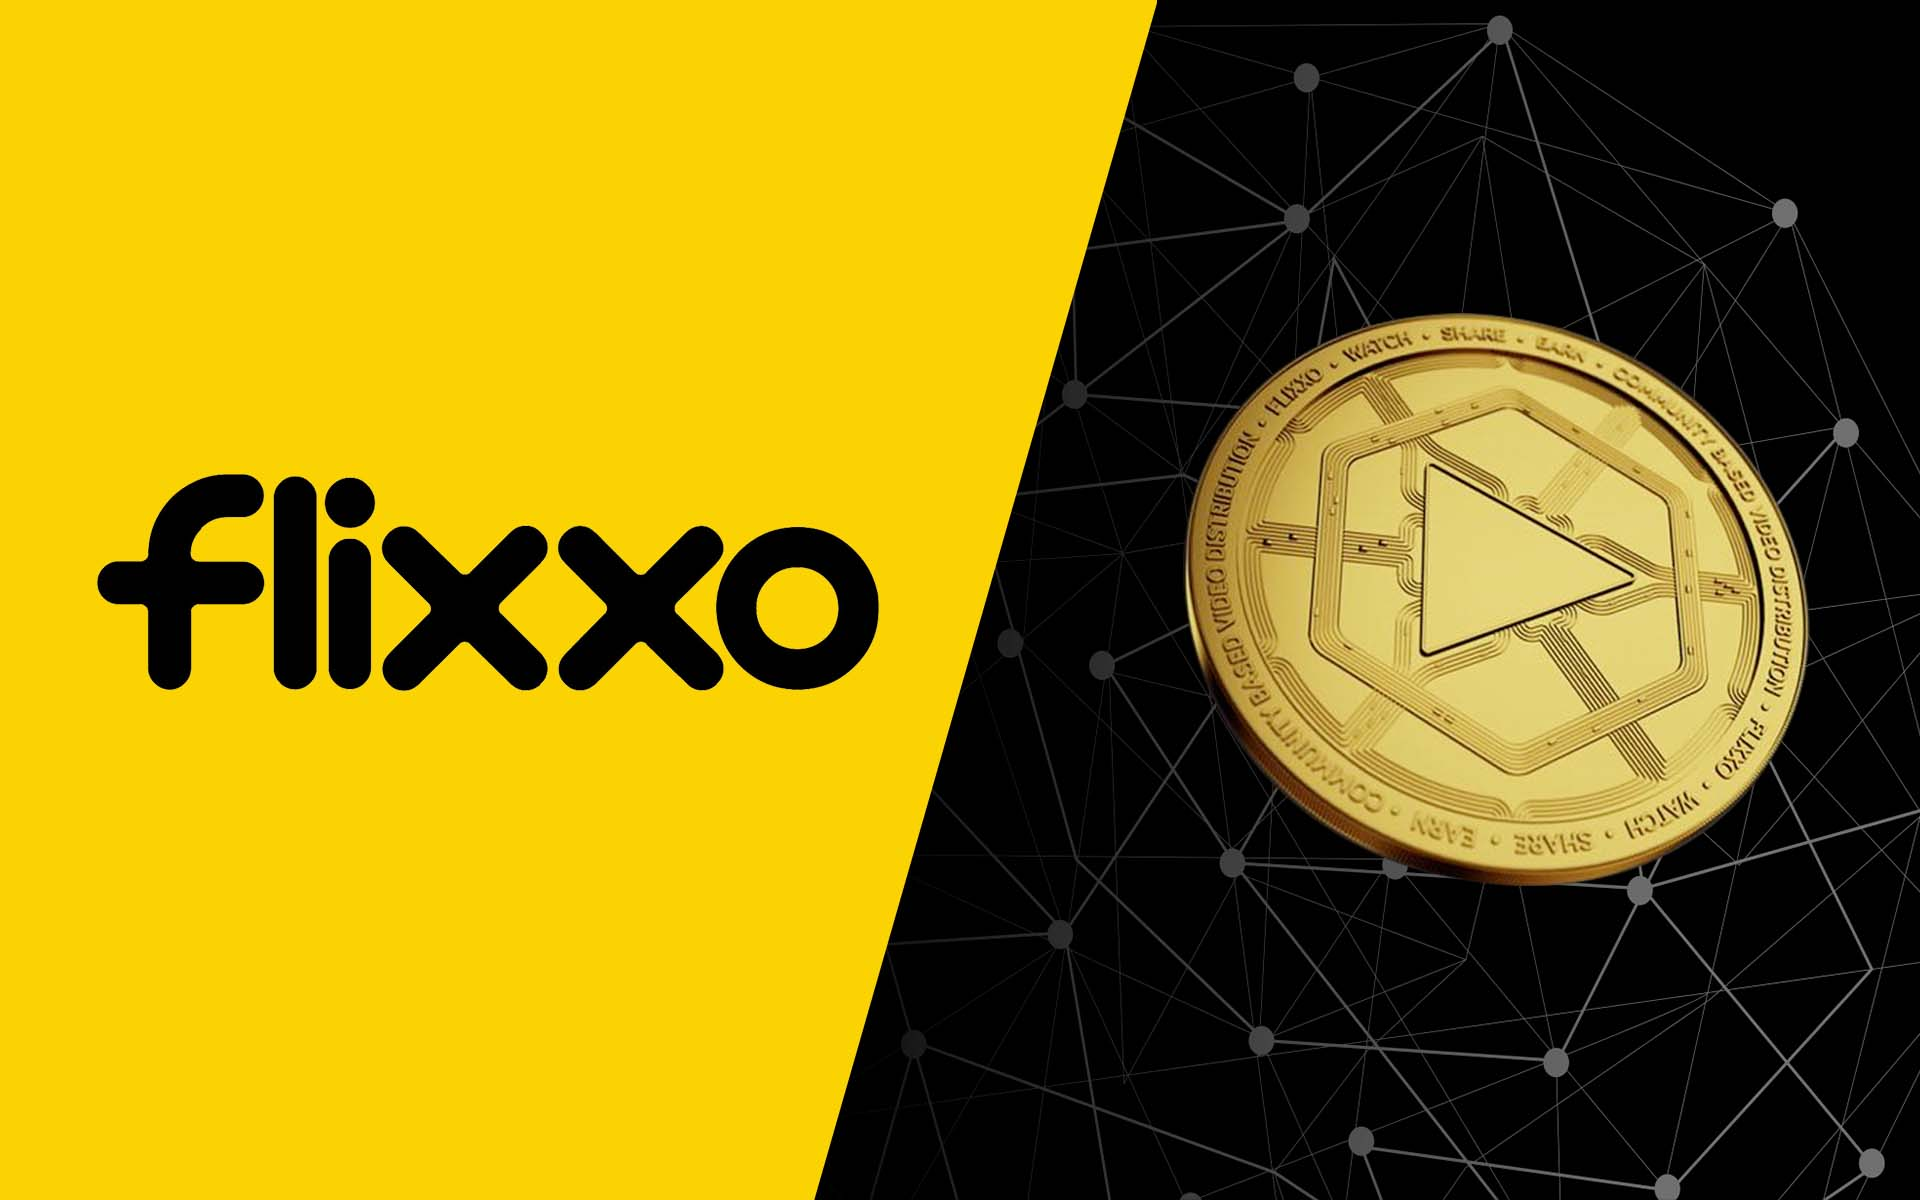 http://bitcoinist.com/flixxo-vs-youtube-david-goliath-video-sharing-platforms/